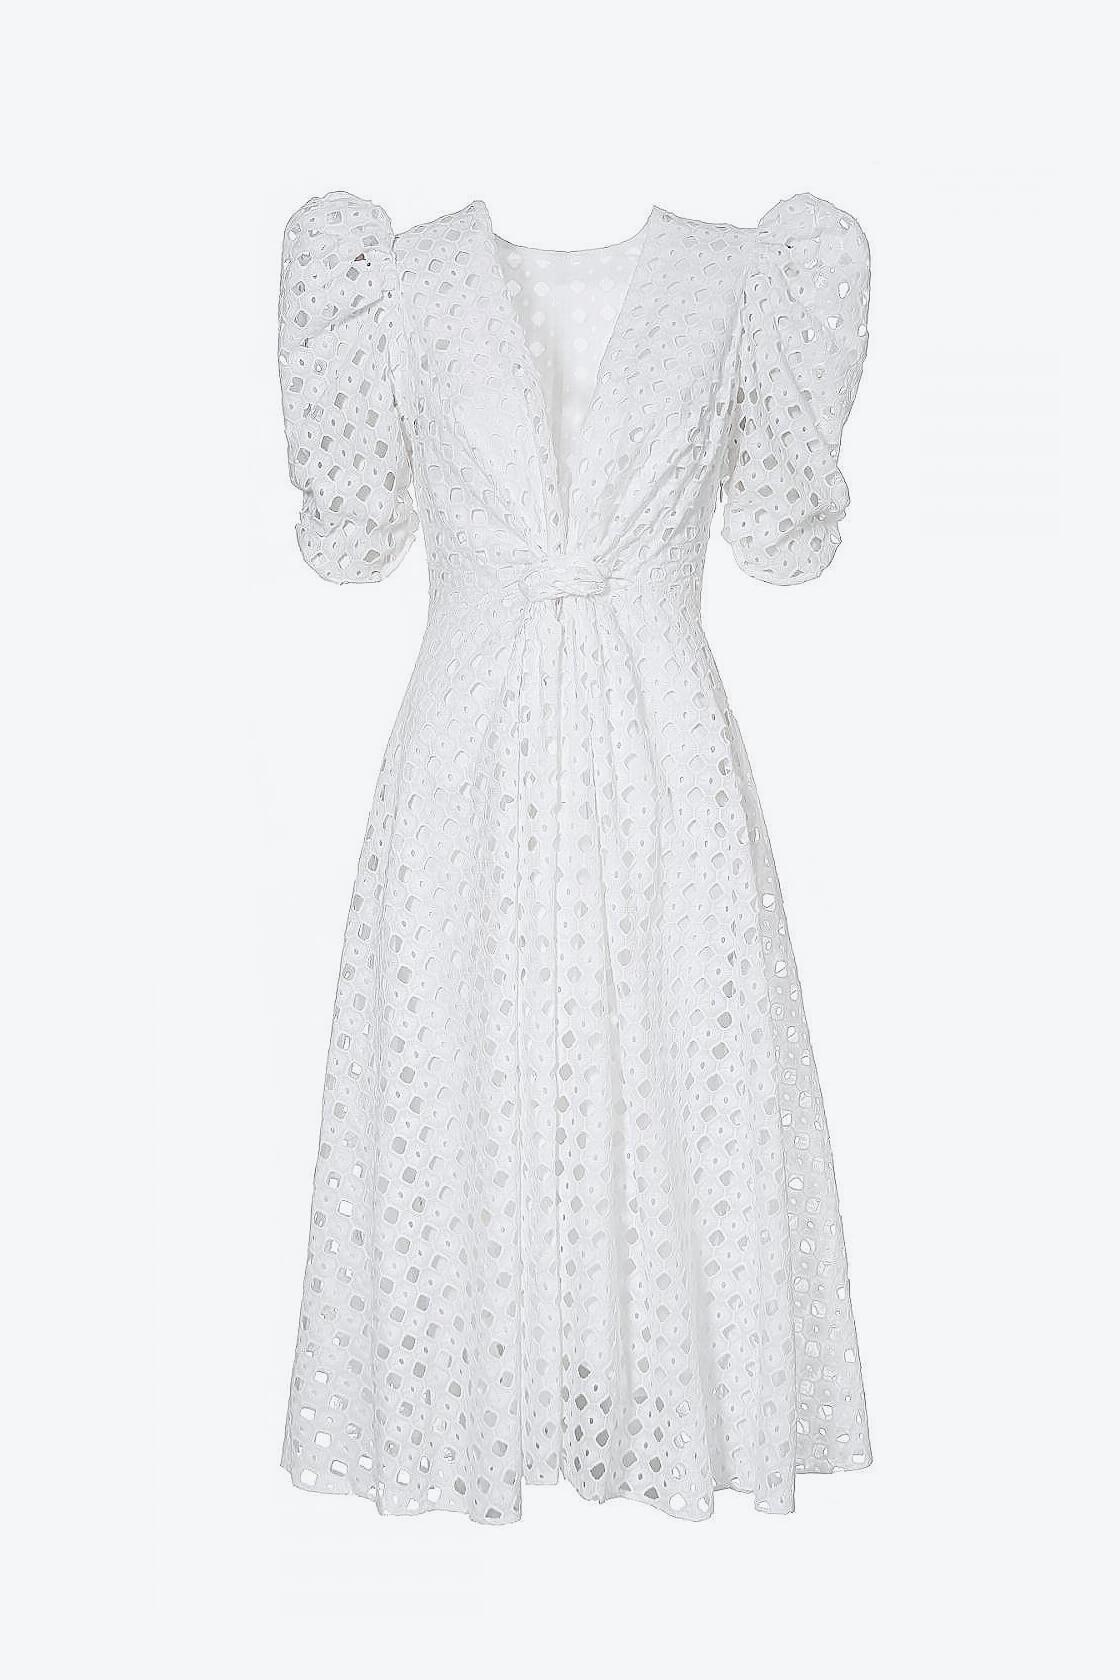 OL100002623 Dress Alta Blanc De Blanc1